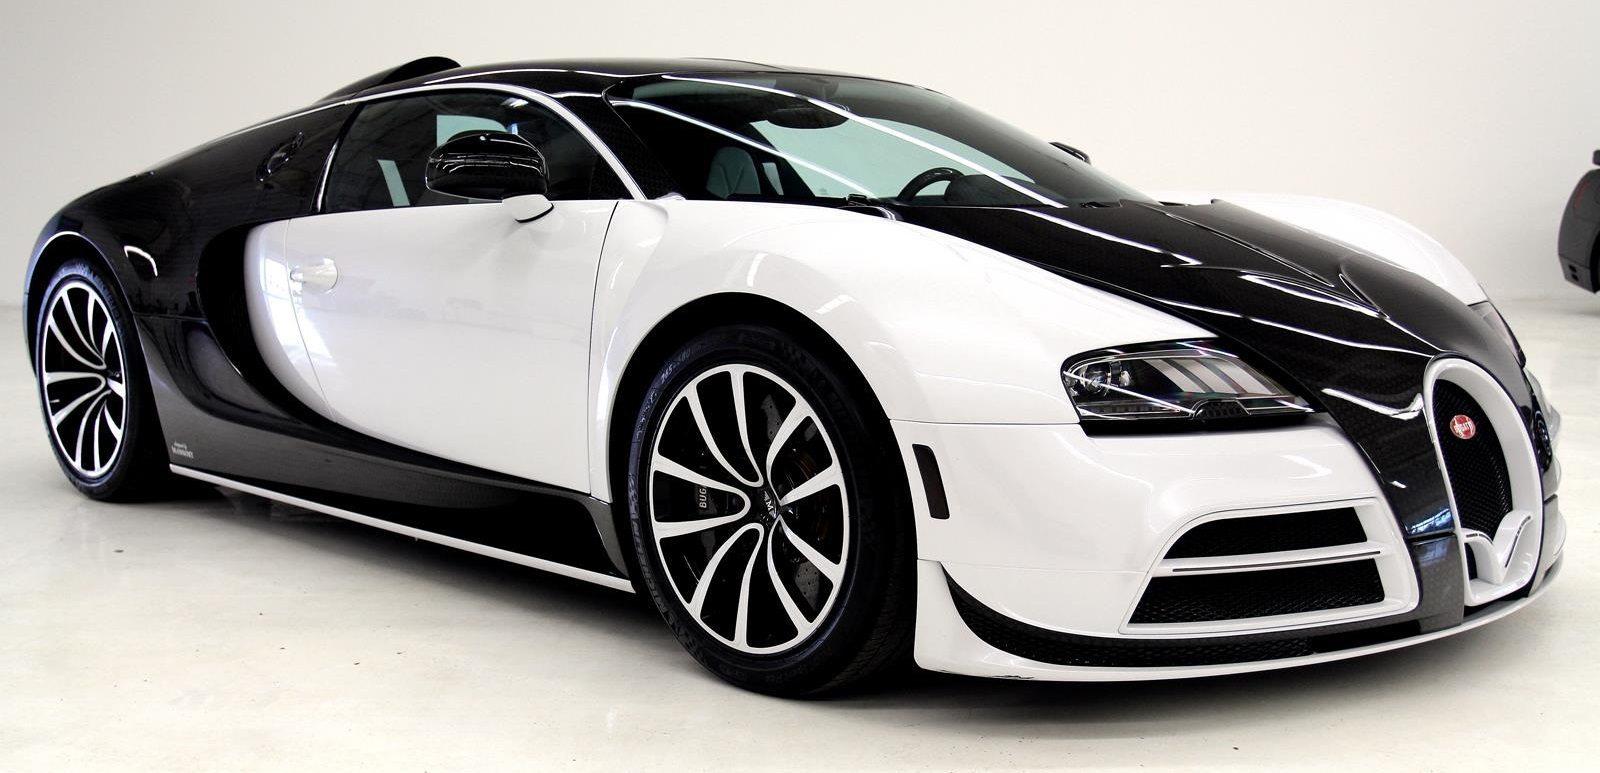 Bugatti Veyron Mansory Vivere Te Koop Voor 2 5m Op Ebay